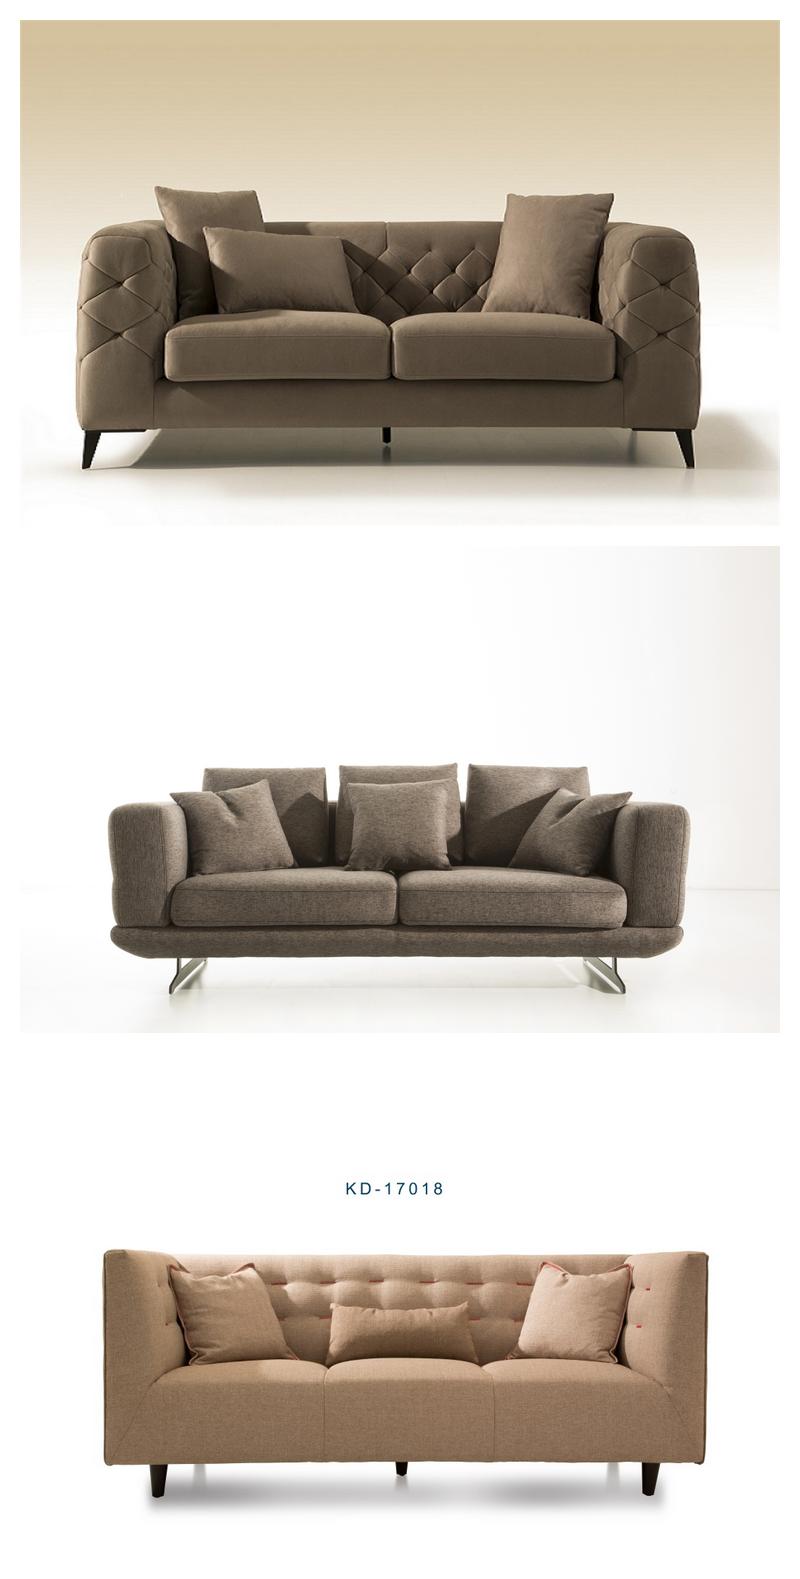 New Design Modern Sofa From Cocheen Sofaset Sofa Modernsofa Cocheendesign Livingroomsofa Fu Sofa Manufacturers Sofa Set Modern Sofa